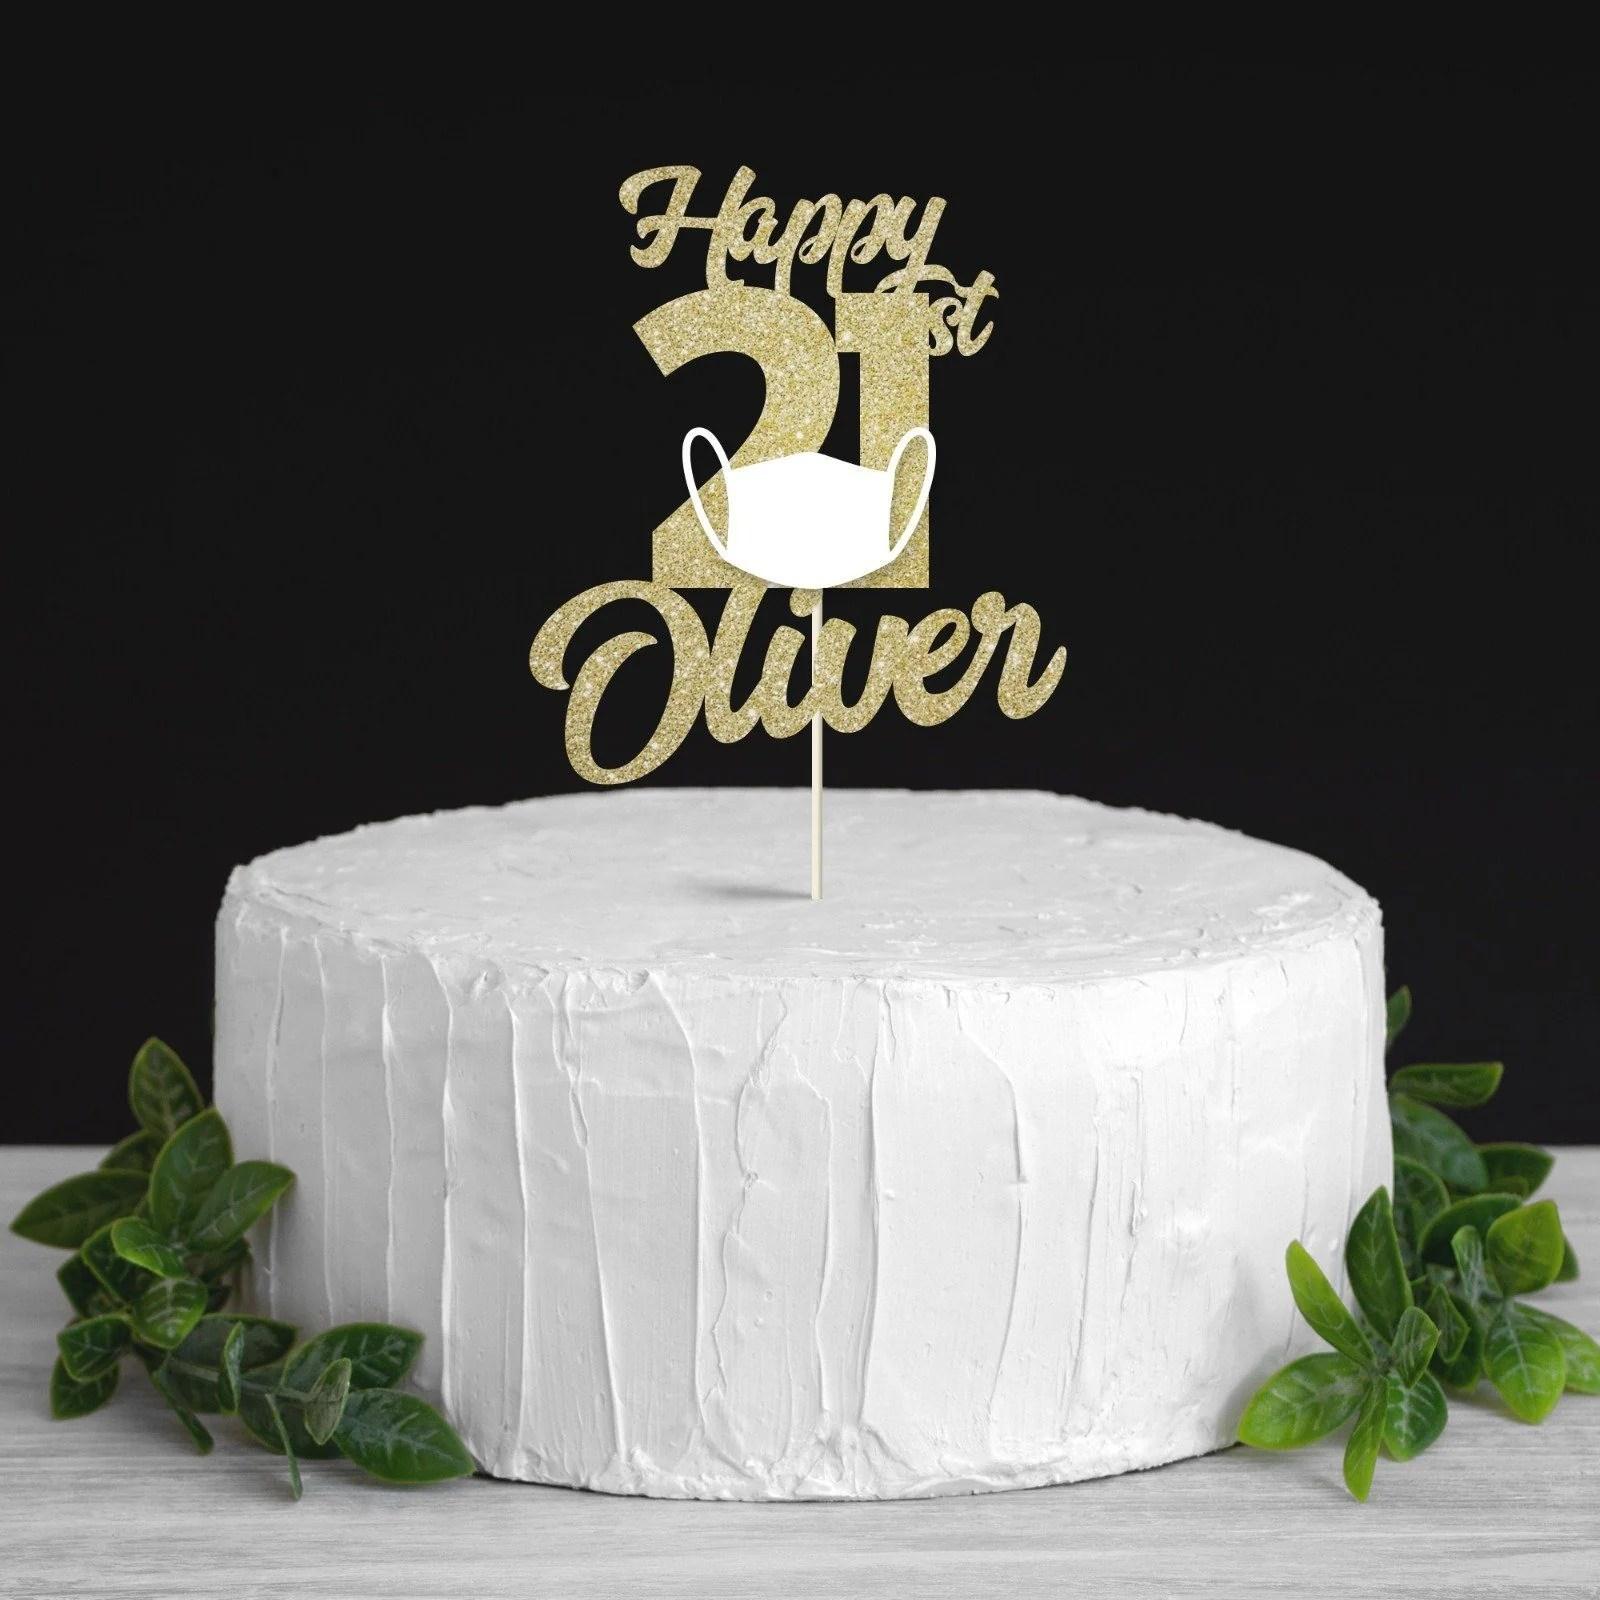 Happy 60th Birthday Man Cake Collection Por Bajin Fashion